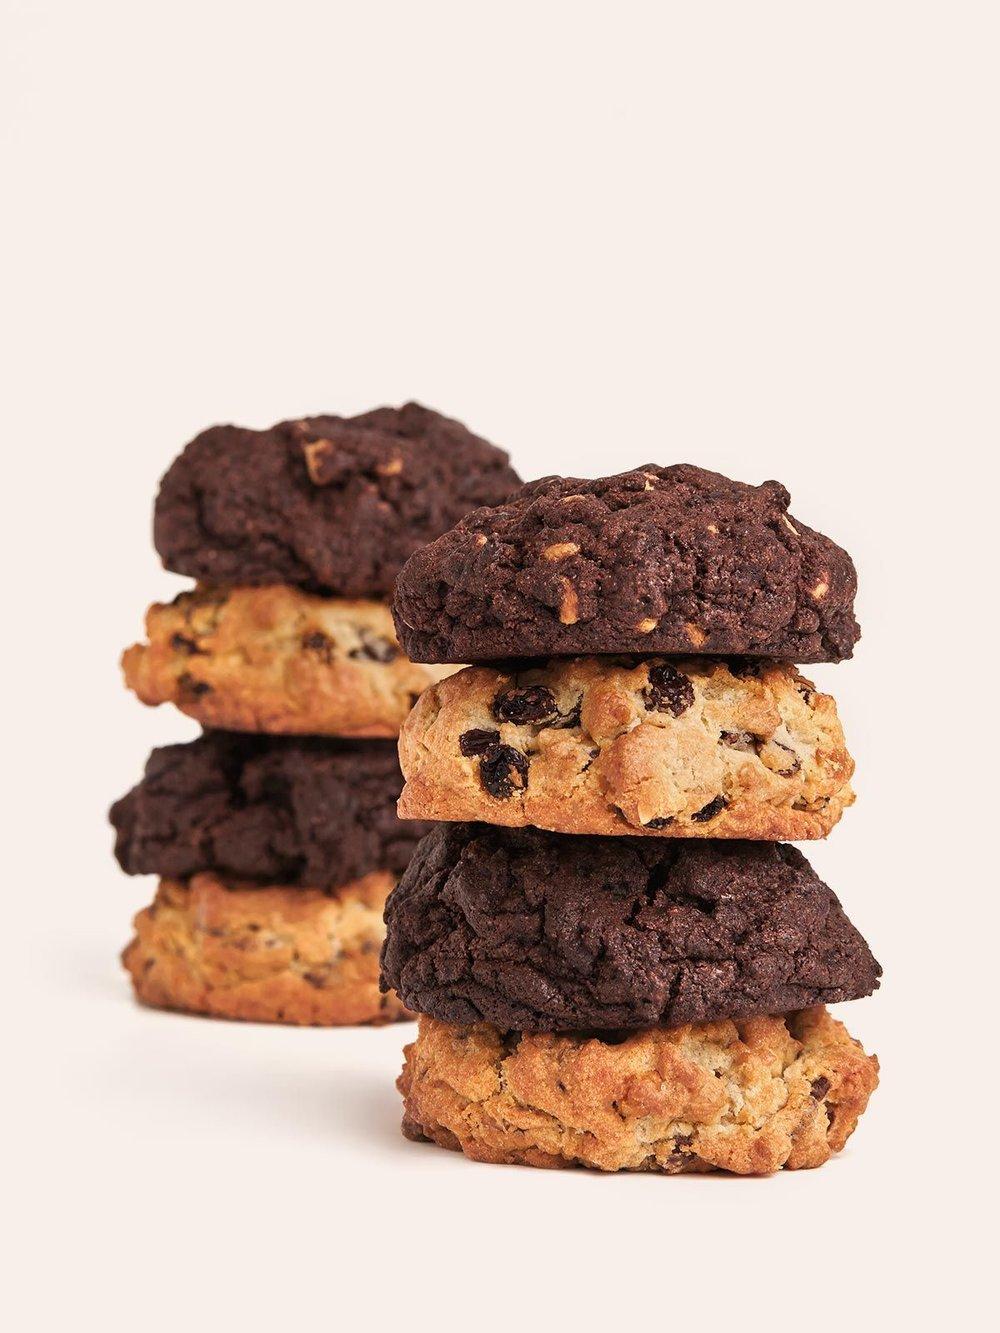 Cookies from Levain